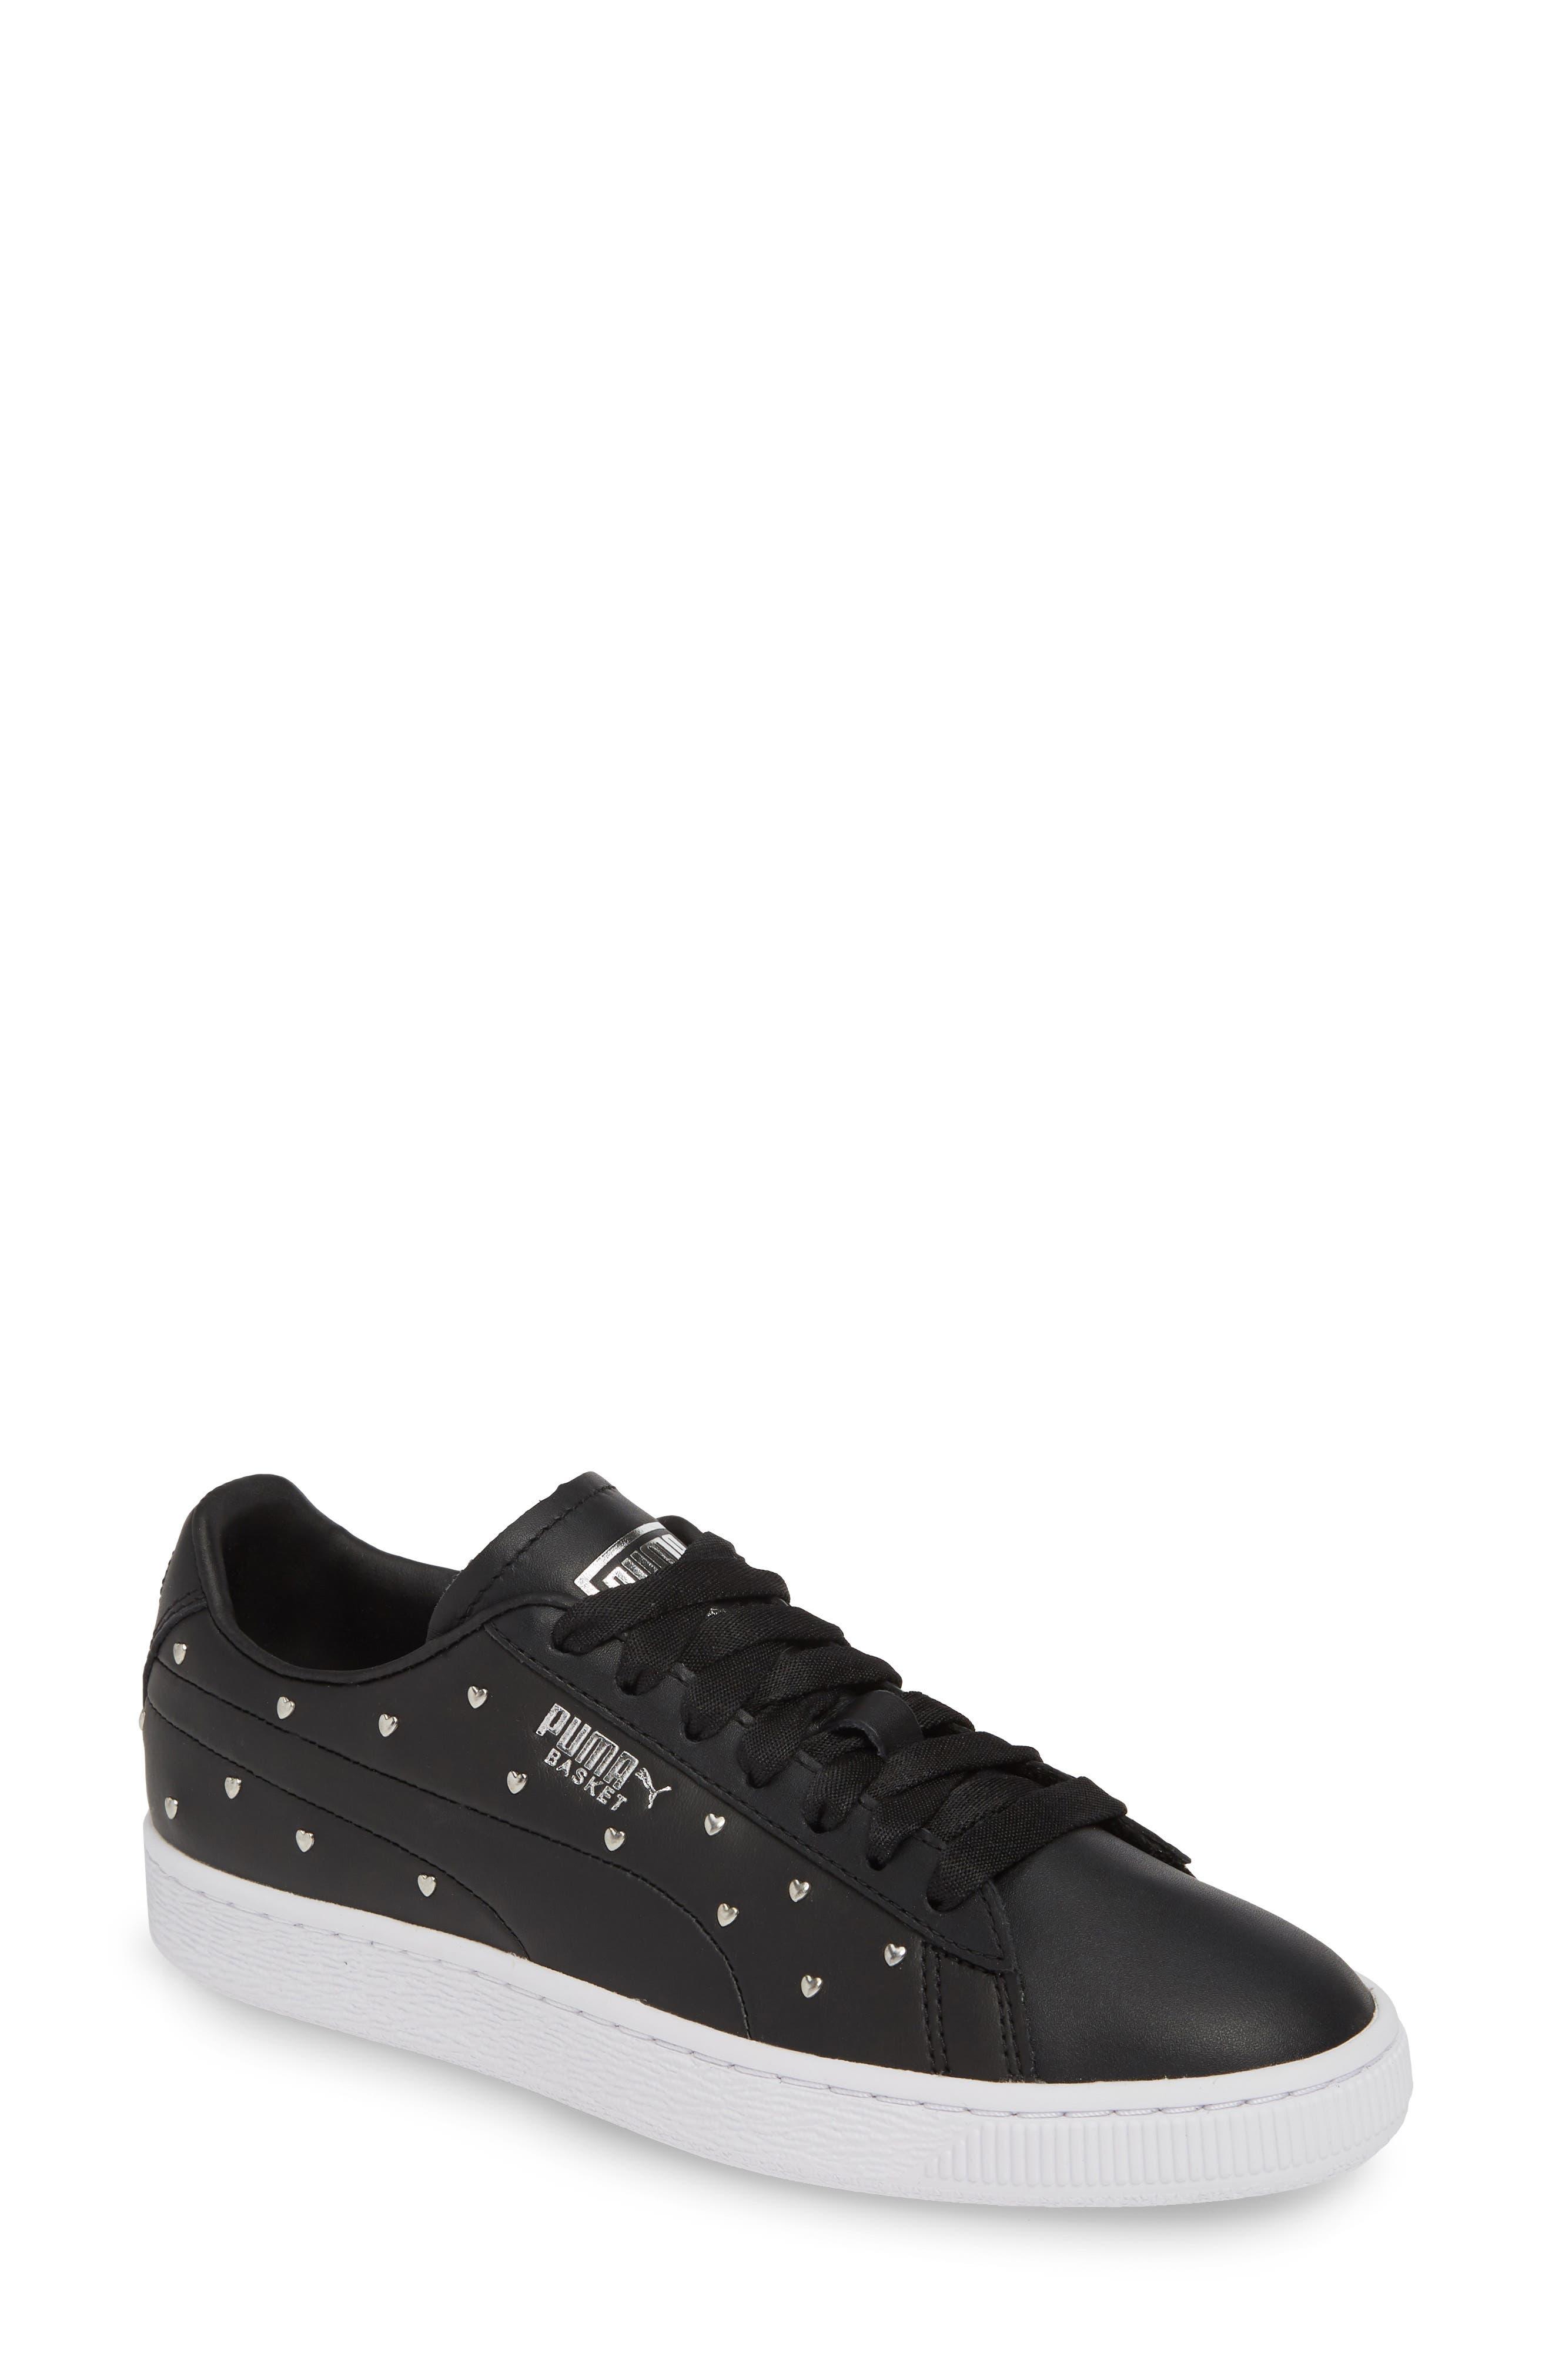 PUMA, Basket Studs Sneaker, Main thumbnail 1, color, BLACK/ SILVER